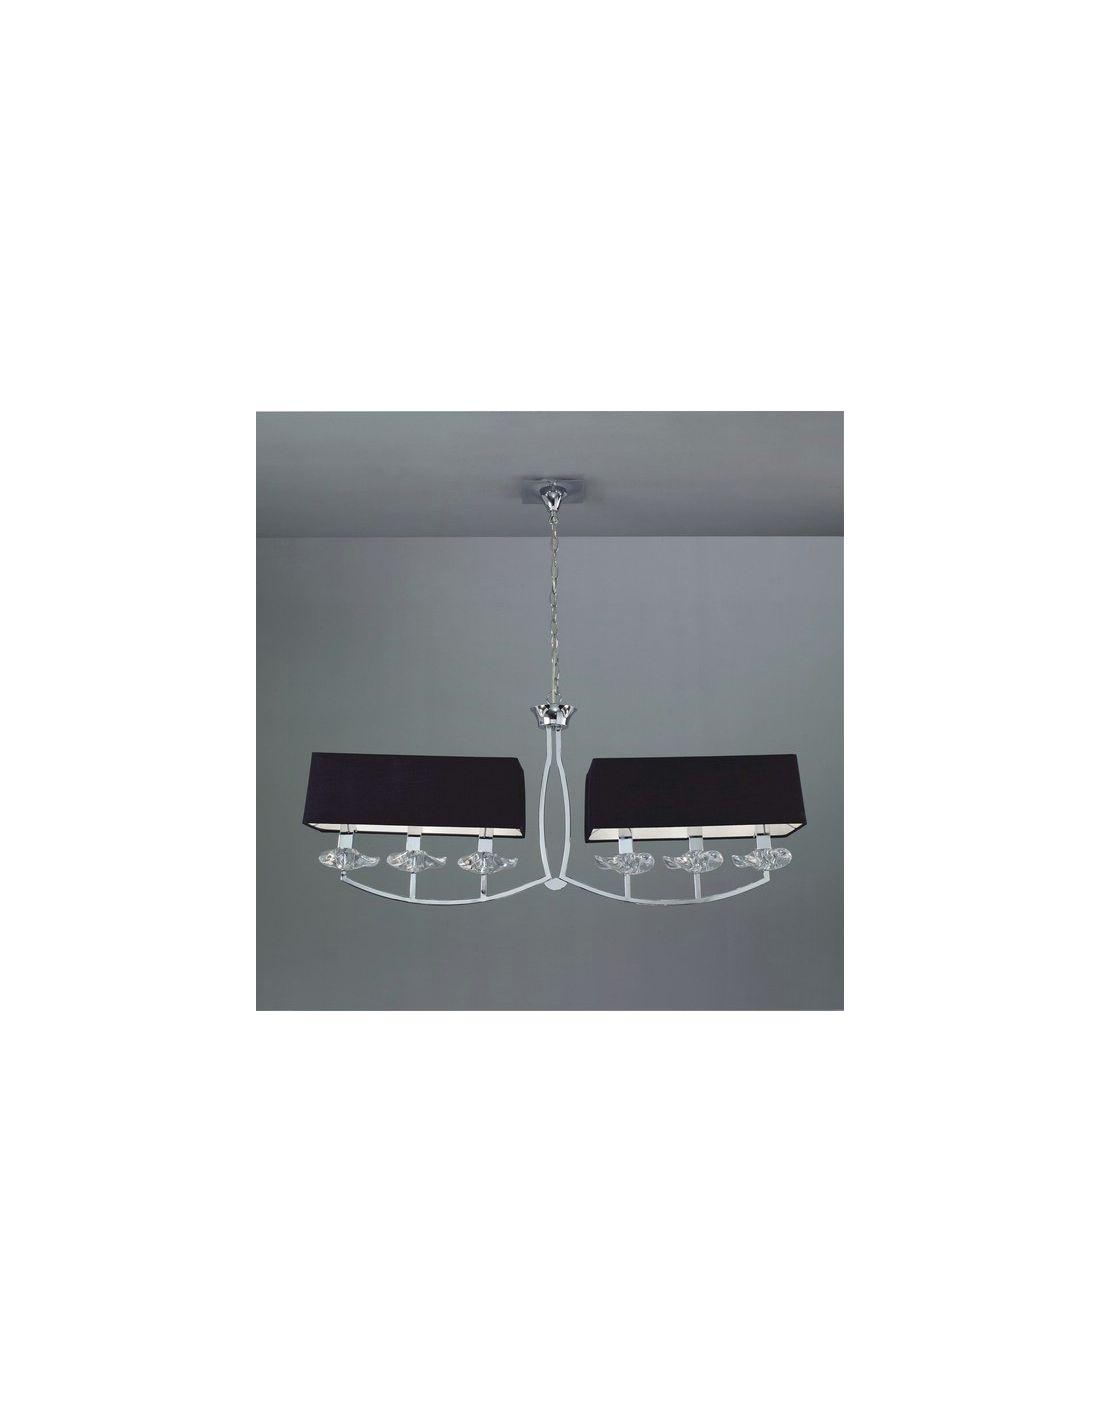 Lamparas lamparas modernas lamparas de techo modernas lamparas baratas lamparas modernas baratas - Lamparas modernas techo ...